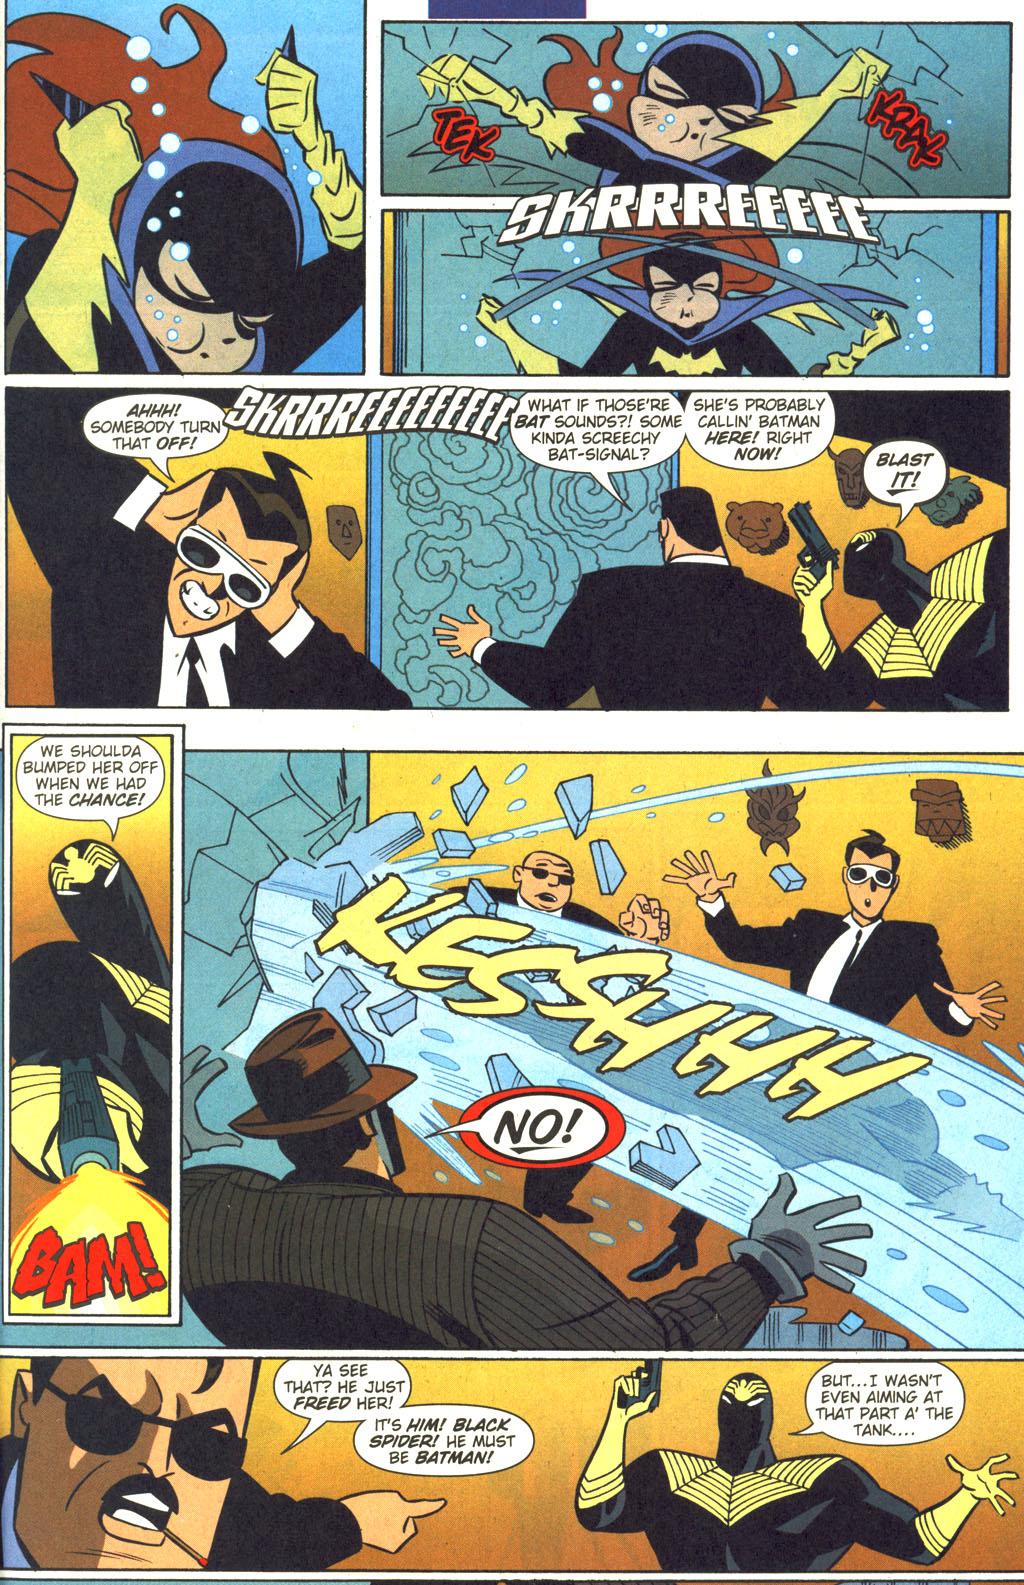 read online batman adventures 2003 comic issue 7